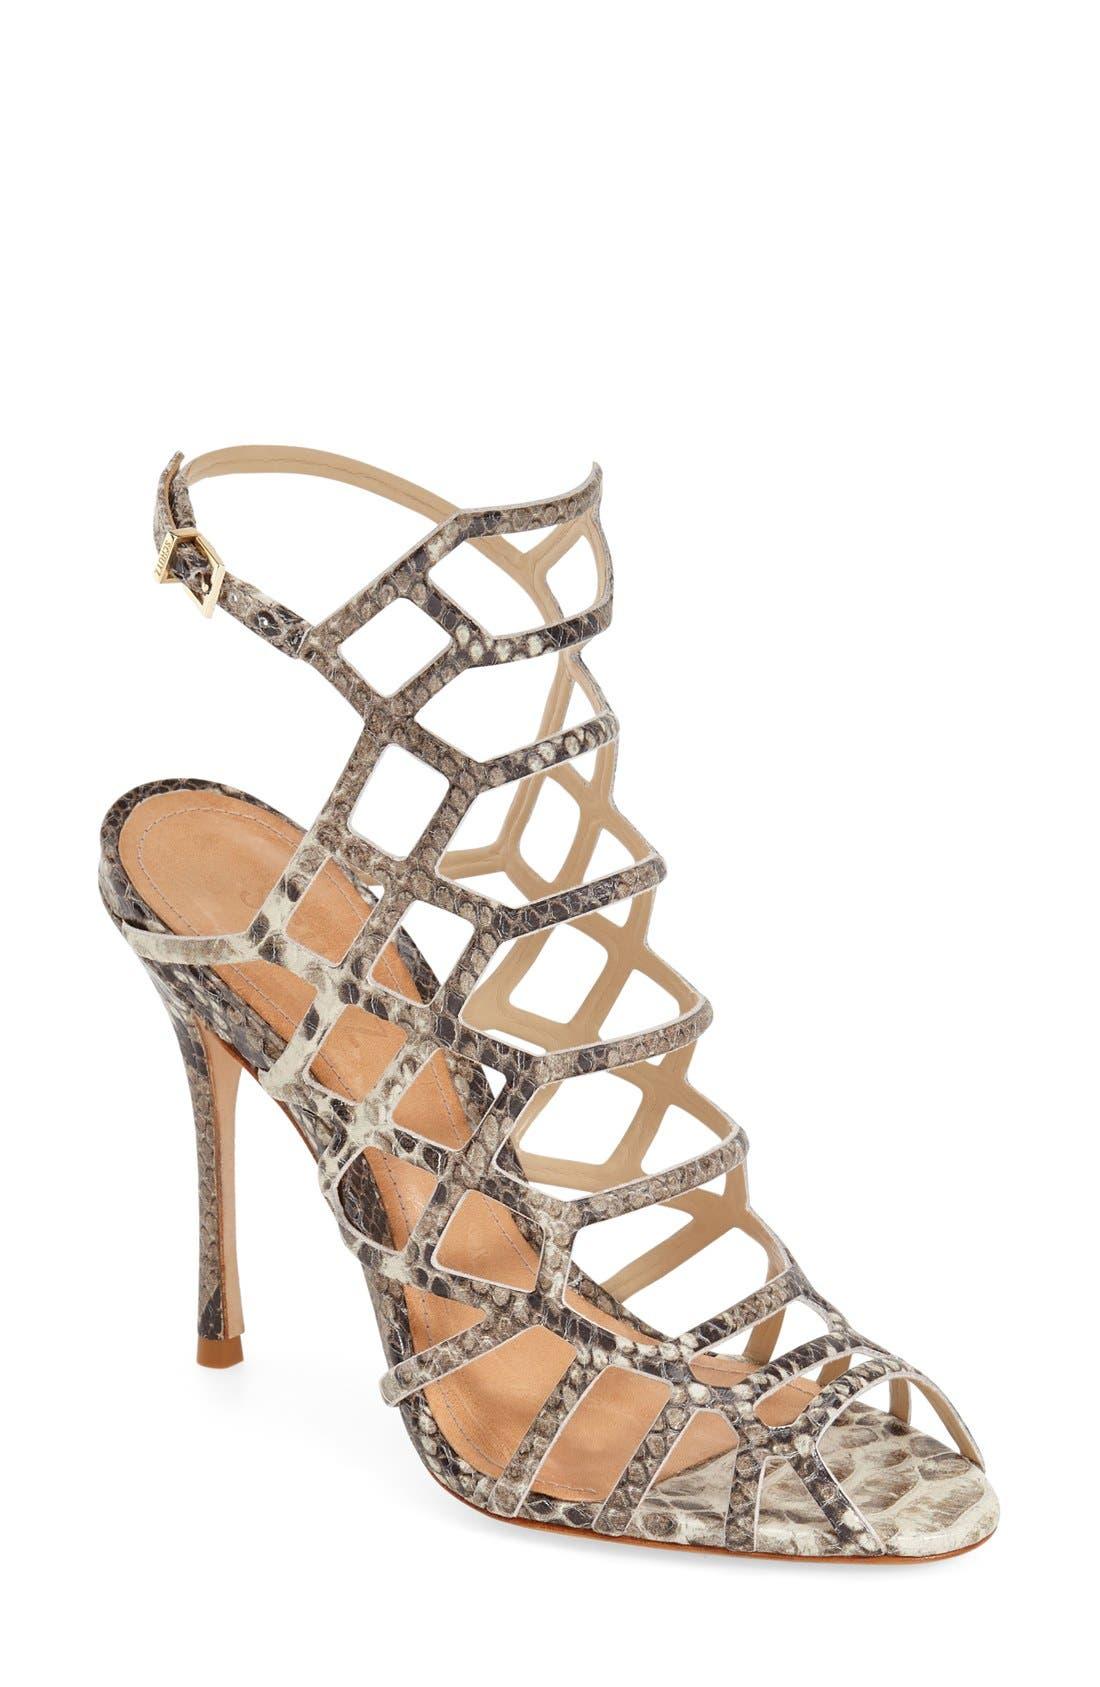 Alternate Image 1 Selected - Schutz 'Juliana' Sandal (Women)